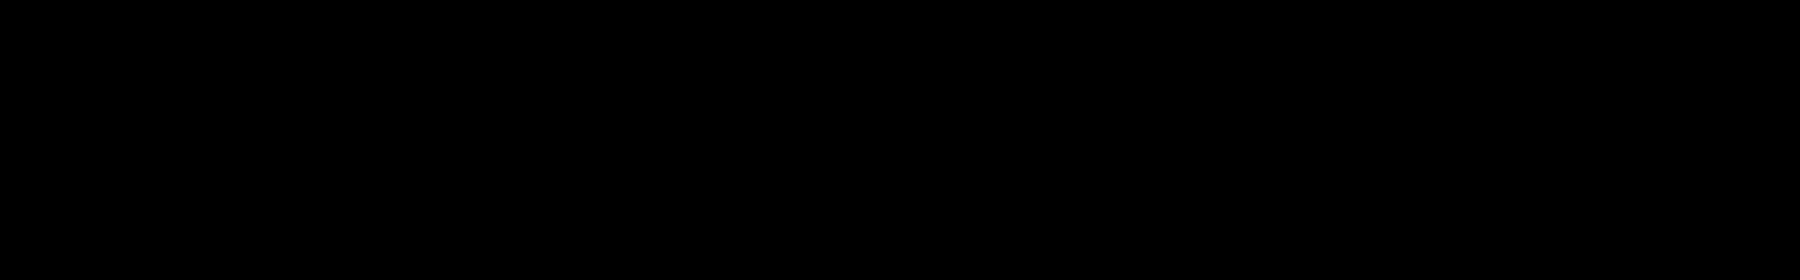 Lazer Pop audio waveform